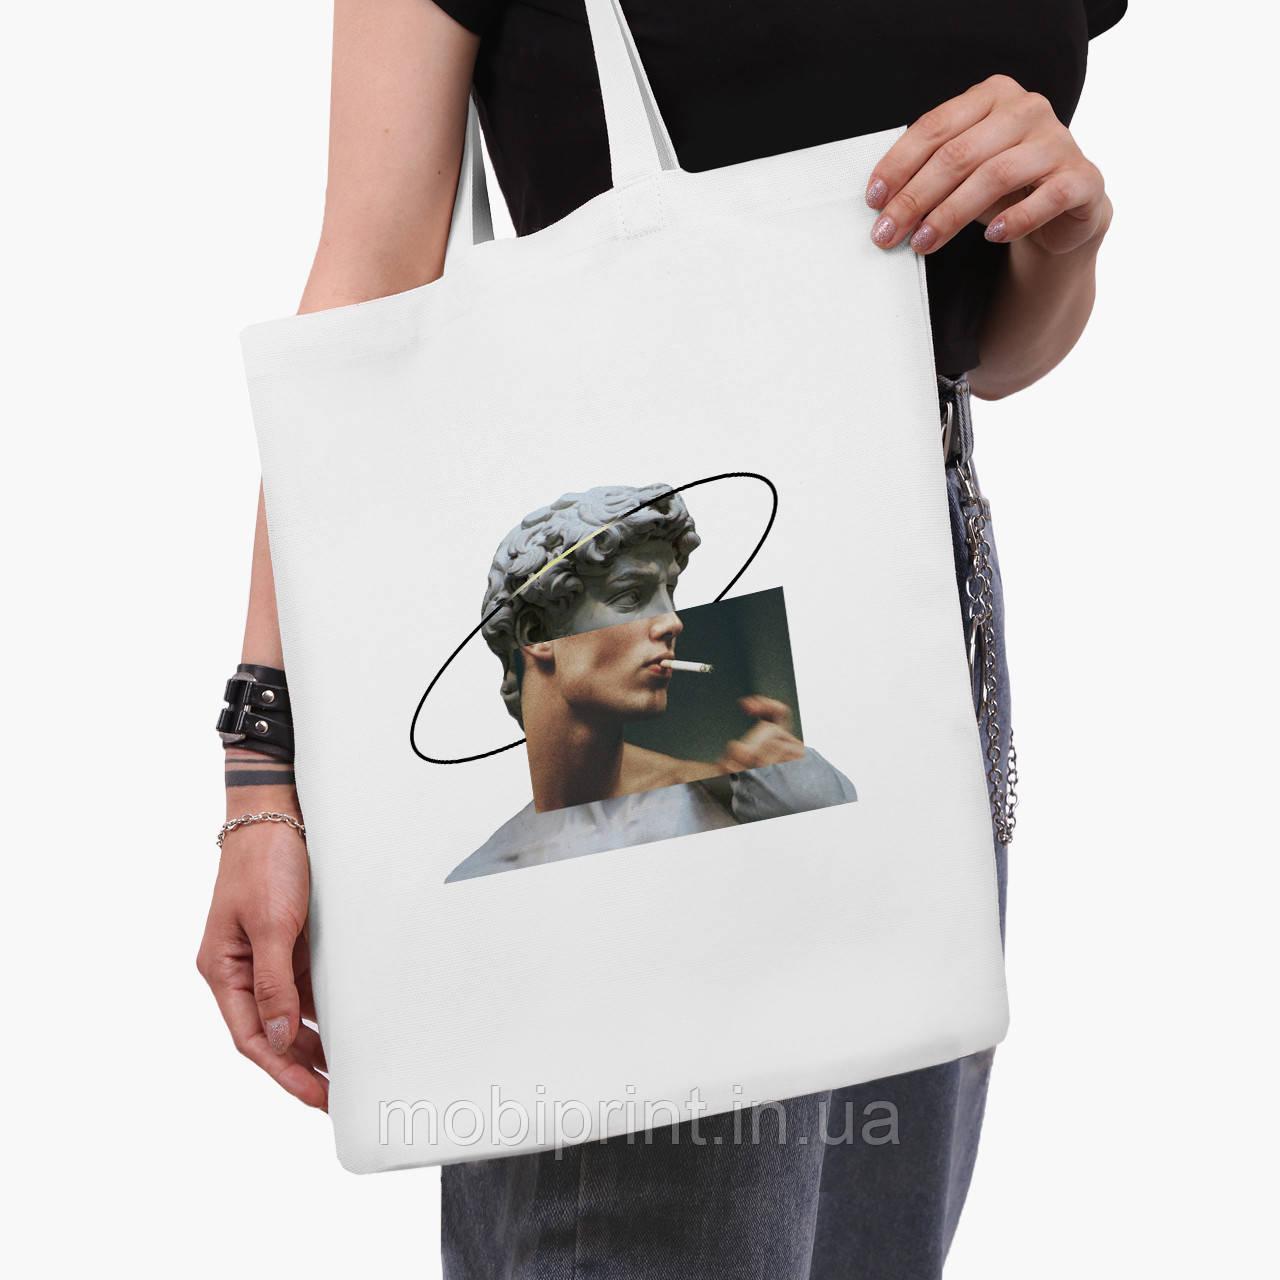 Эко сумка шоппер белая Давид Микеланджело - Ренессанс (David Michelangelo) (9227-1201-3)  41*35 см